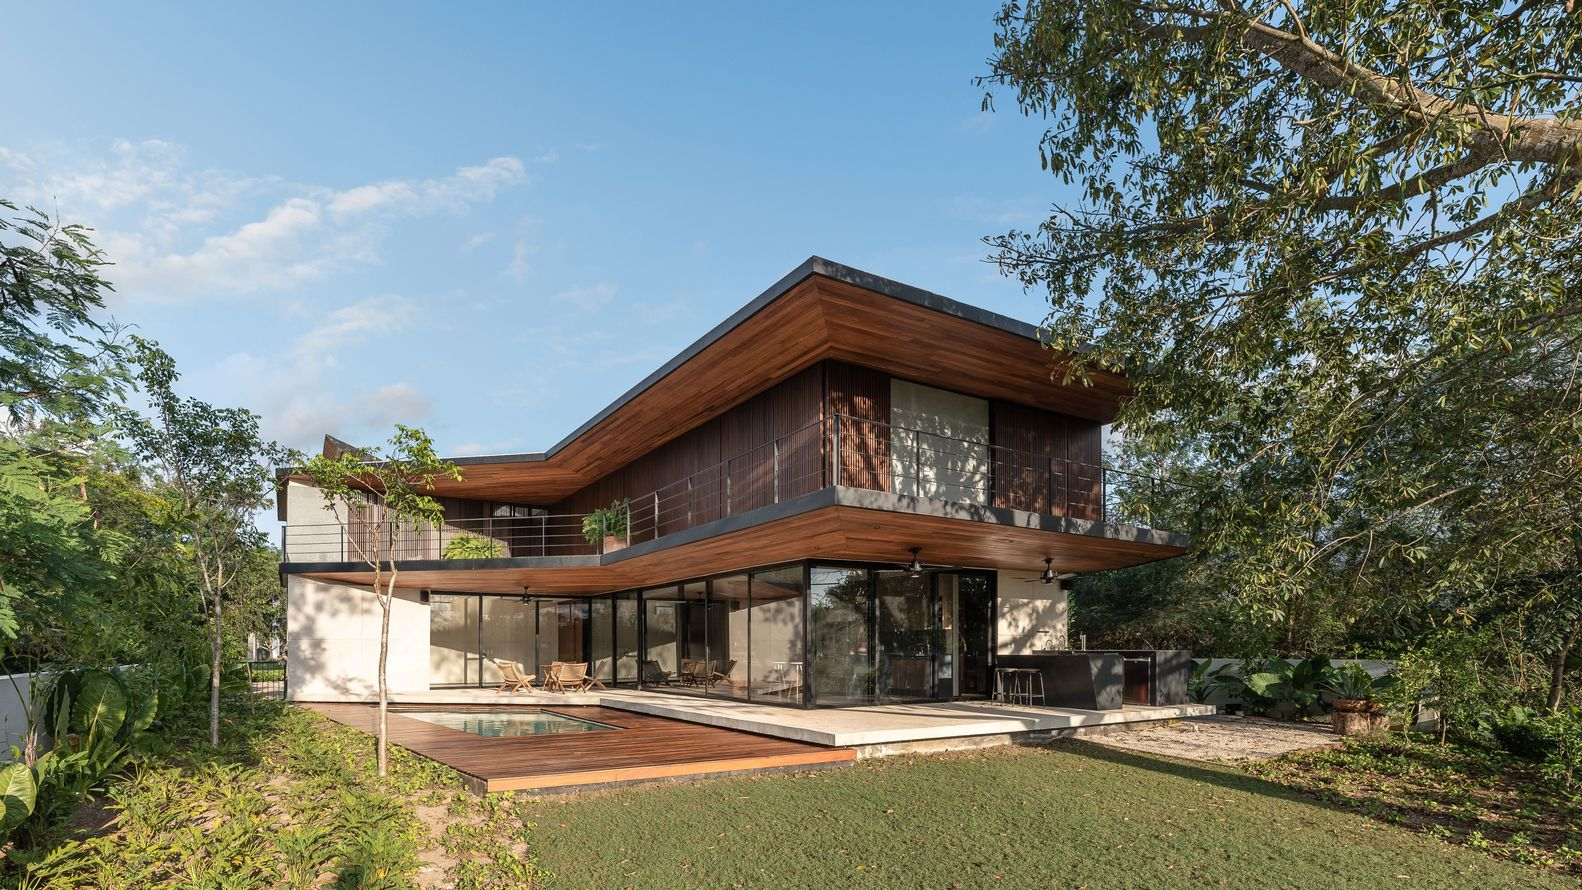 Wood house exterior, cozy backyard